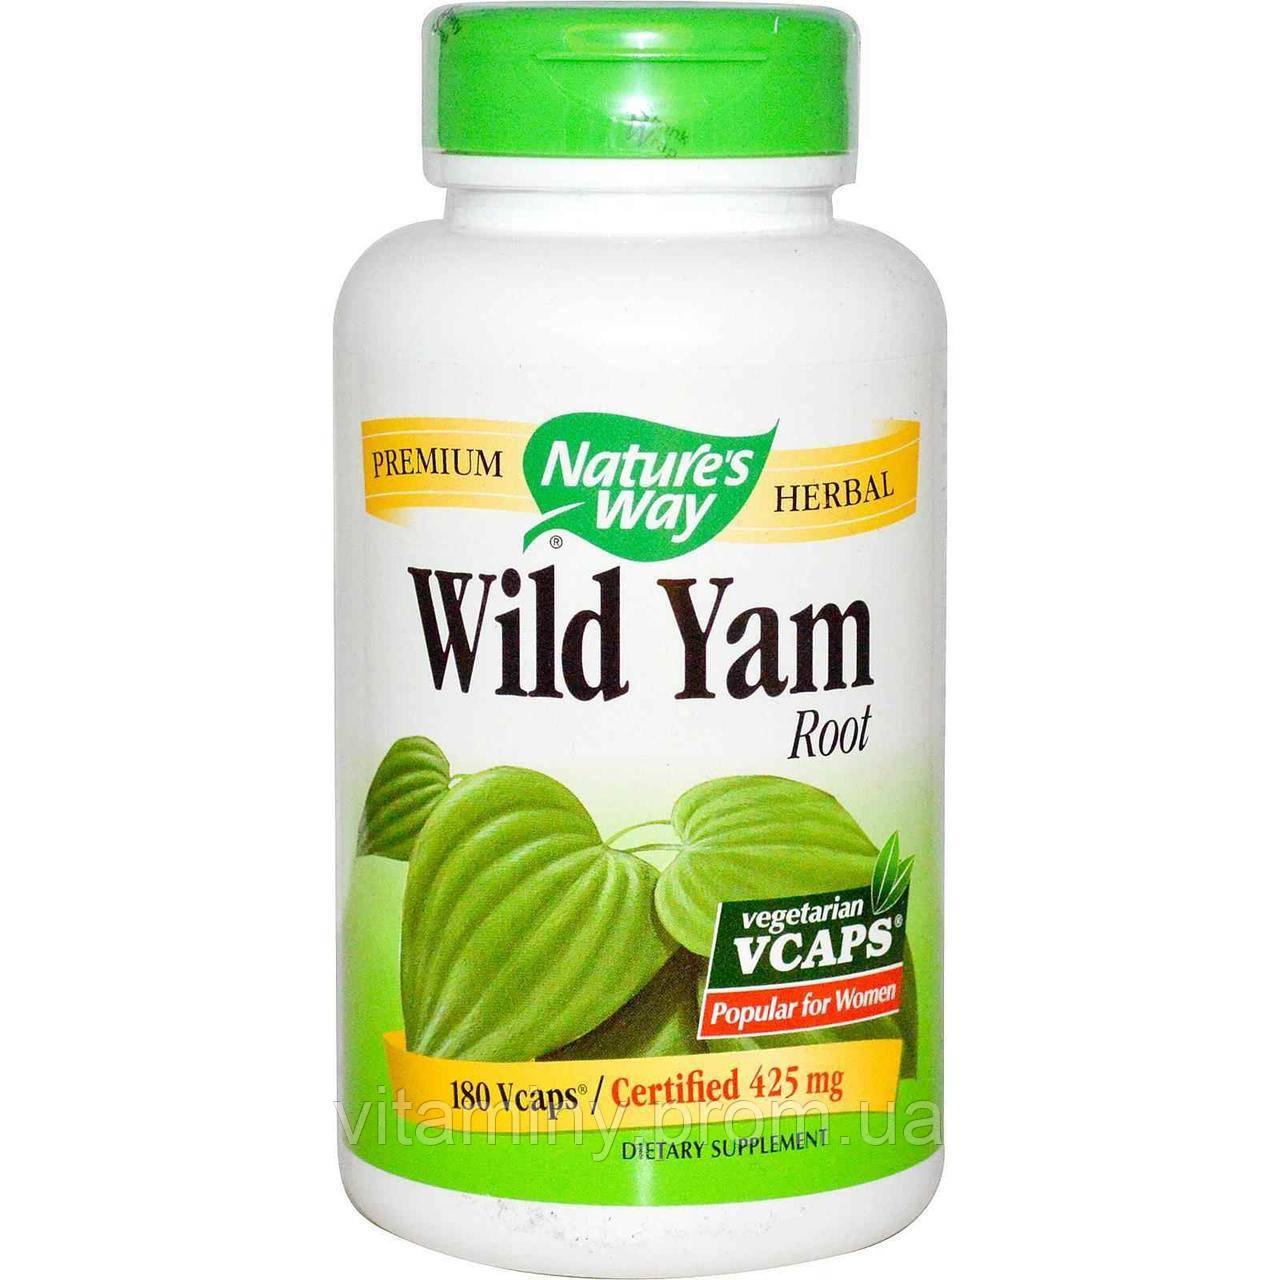 "Дикий ямс, Wild Yam, Nature's Way, 425 мг, 180 капсул - Интернет-магазин ""Американский рай"" в Киеве"